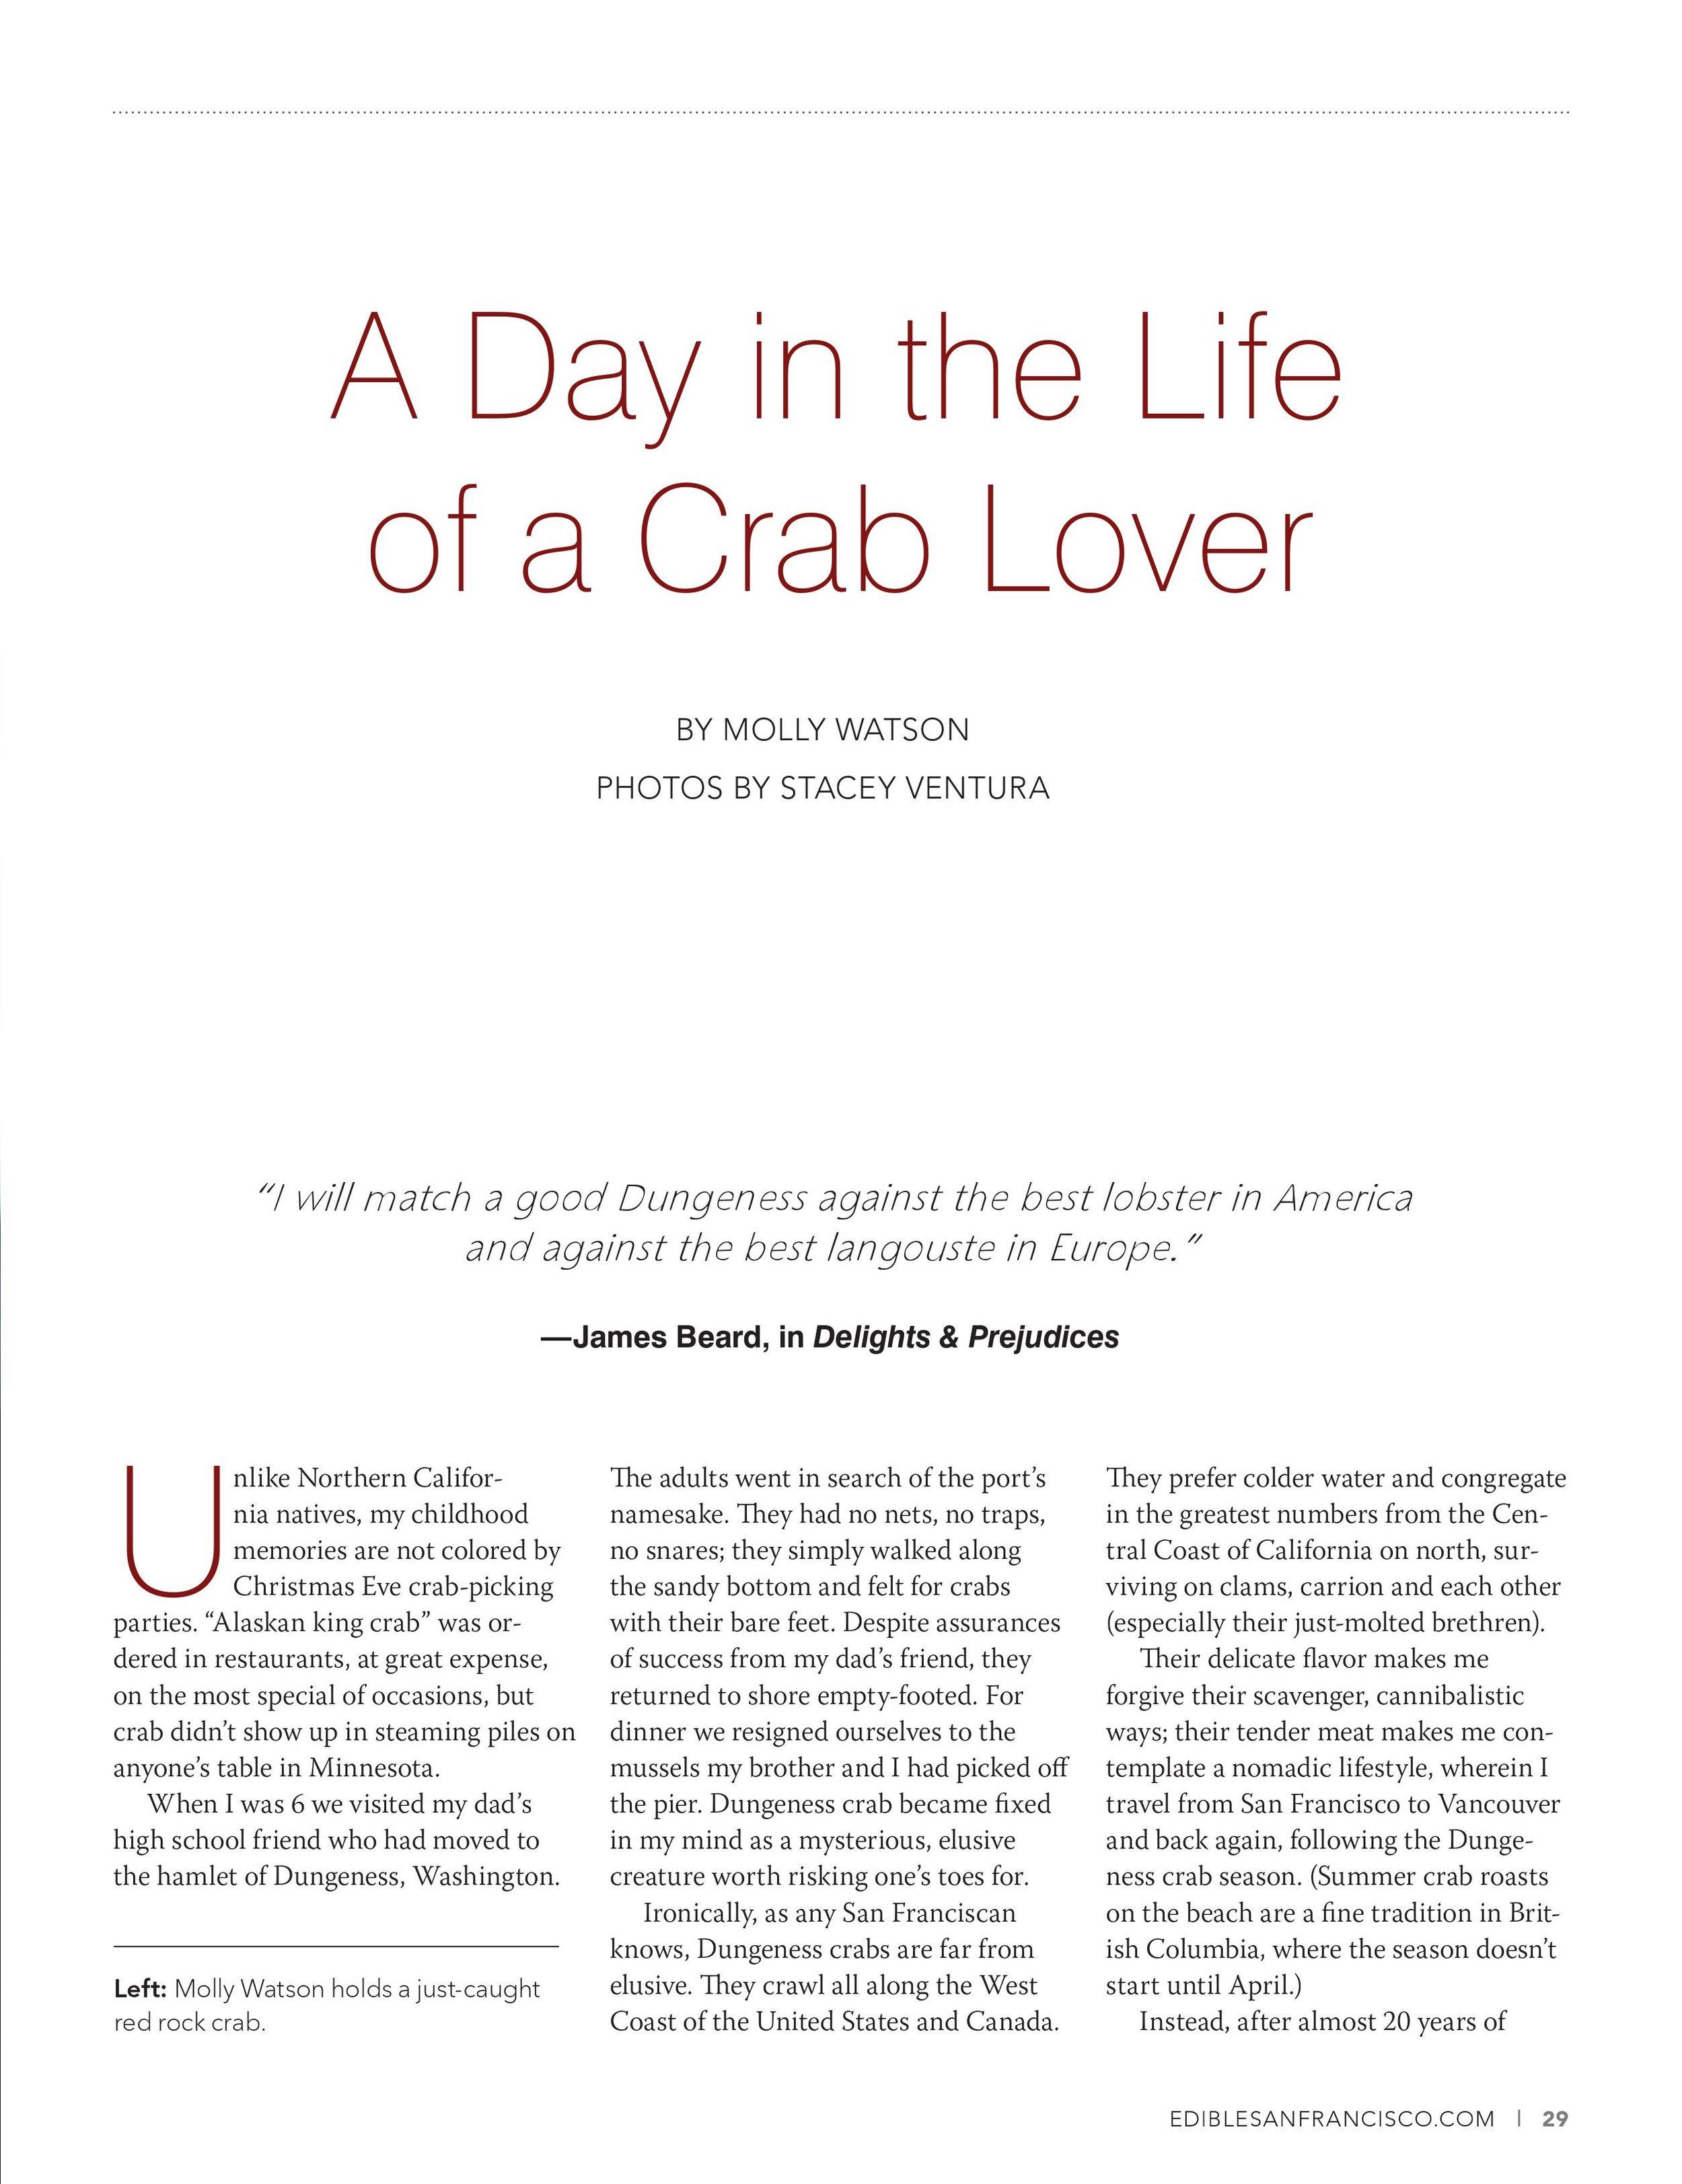 Crab2.jpg